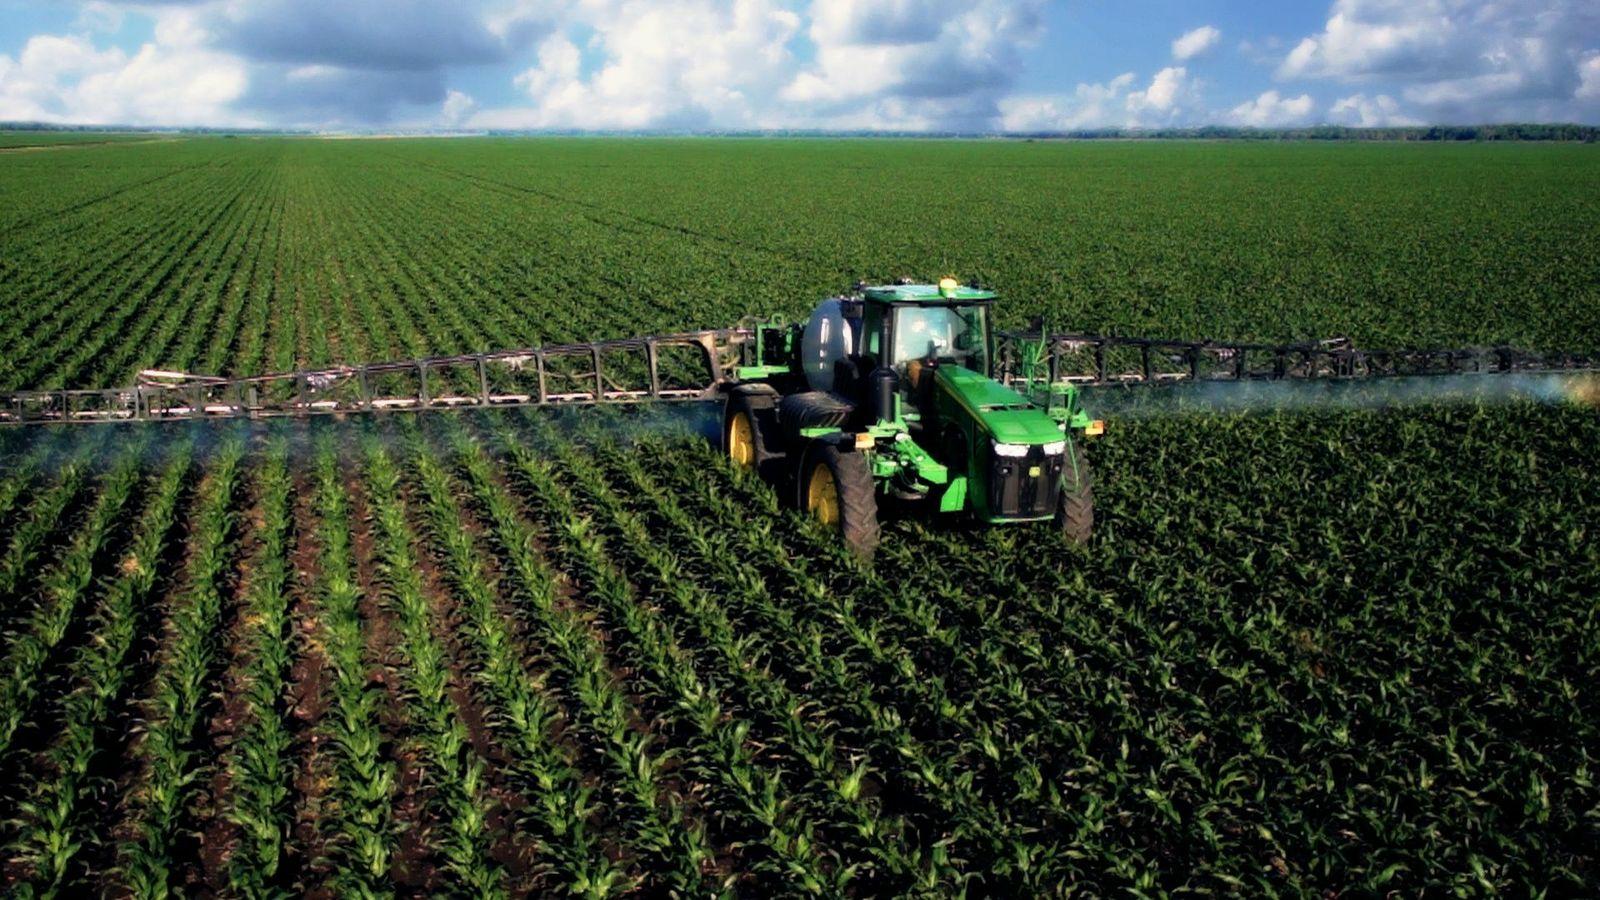 Figure      SEQ Figure \* ARABIC    1      :  Farming process are increasingly becoming mechanized